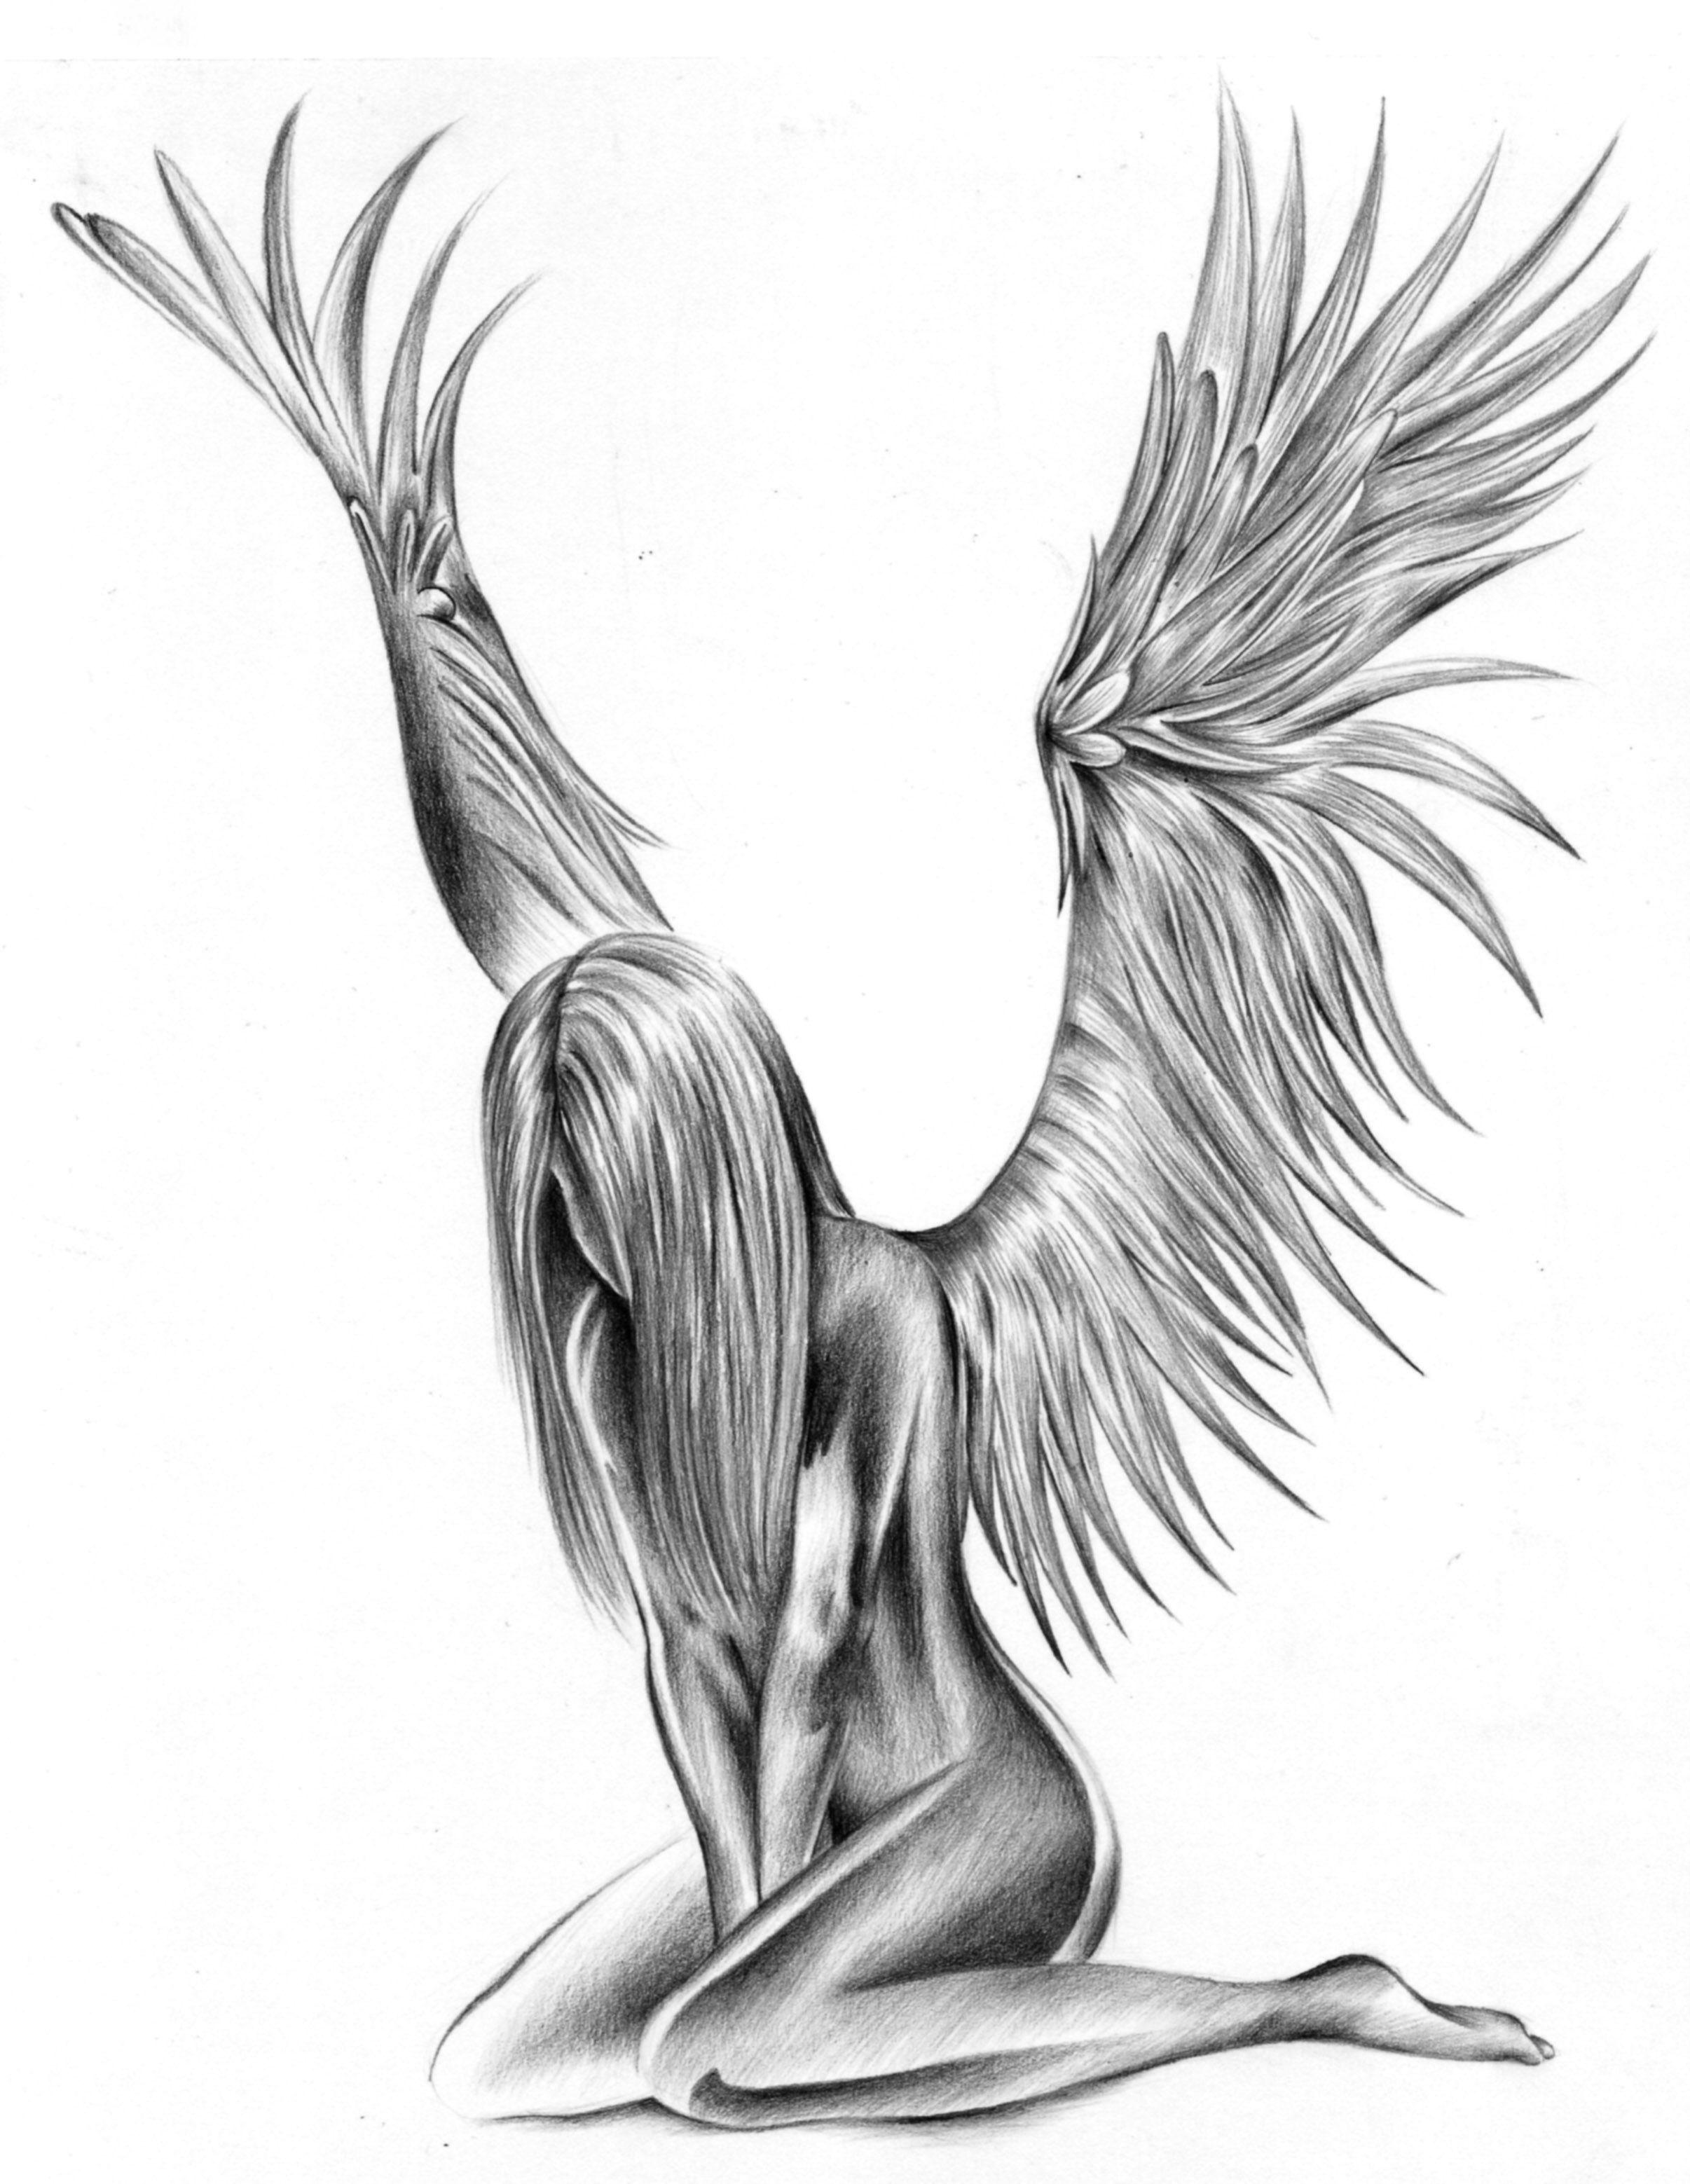 Pin eulen tattoo bedeutungen f on pinterest - Pin Kneeling Angel Tattoo Image Gallery Angeltattoo On Pinterest